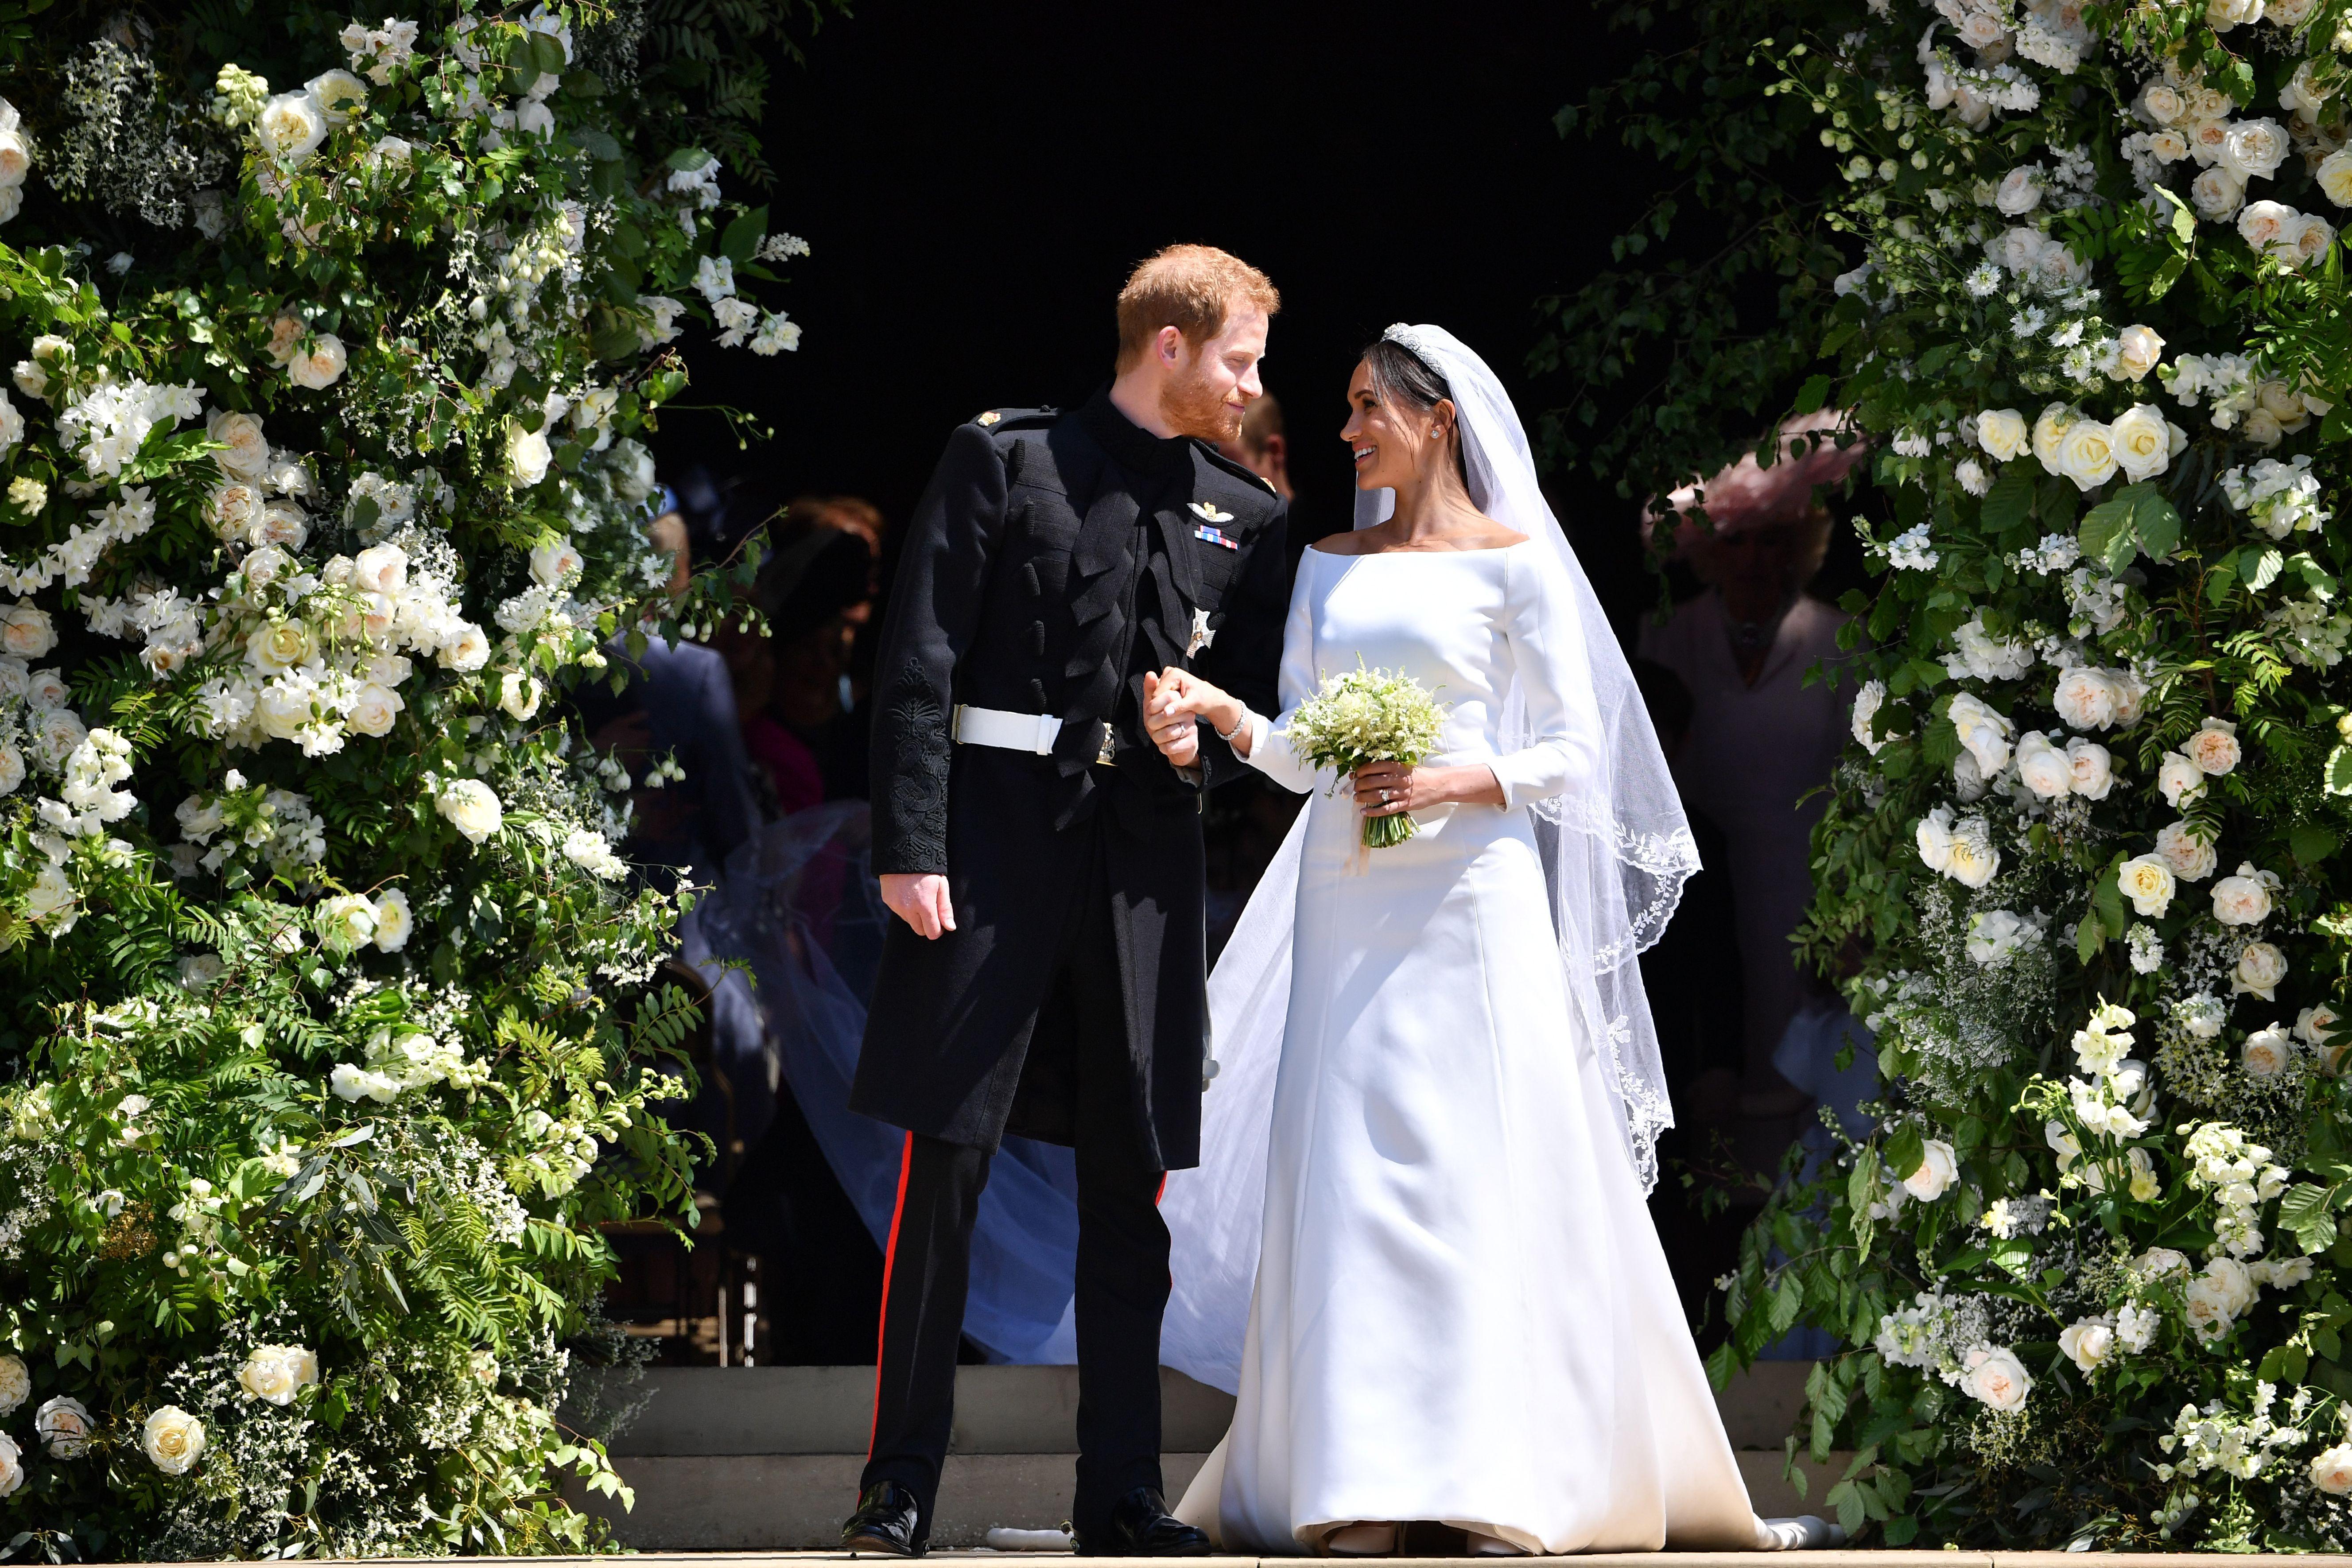 Prince harry meghan markle royal wedding decorations what will the prince harry meghan markle royal wedding decorations what will the royal wedding look like izmirmasajfo